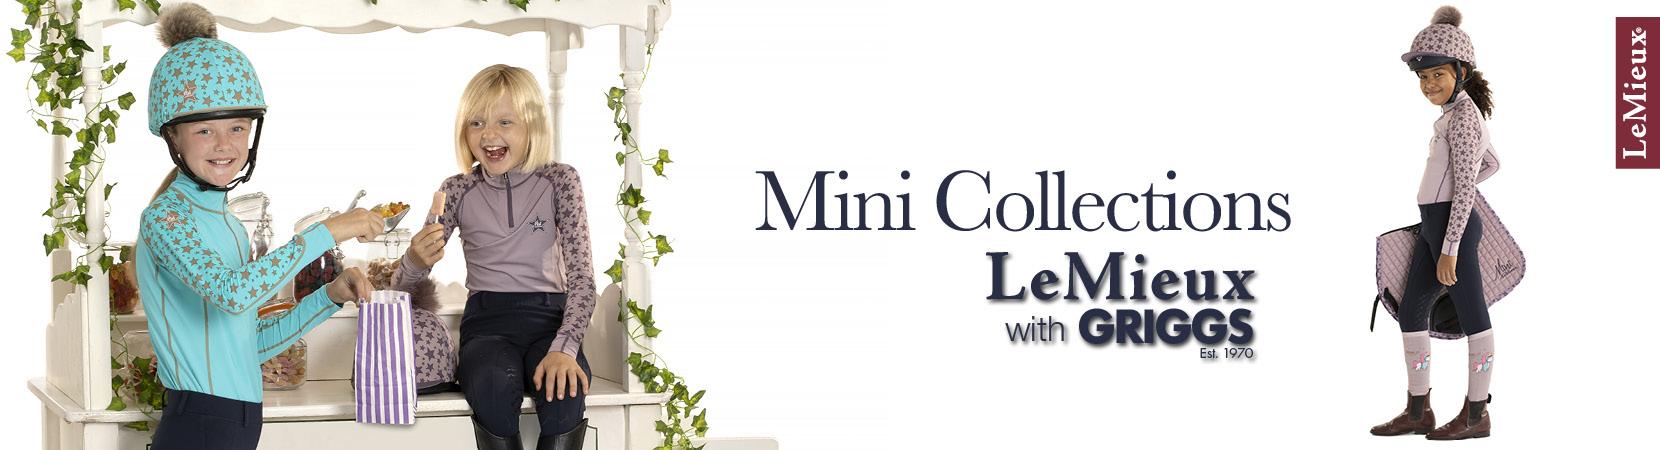 My Lemieux Clothing banner